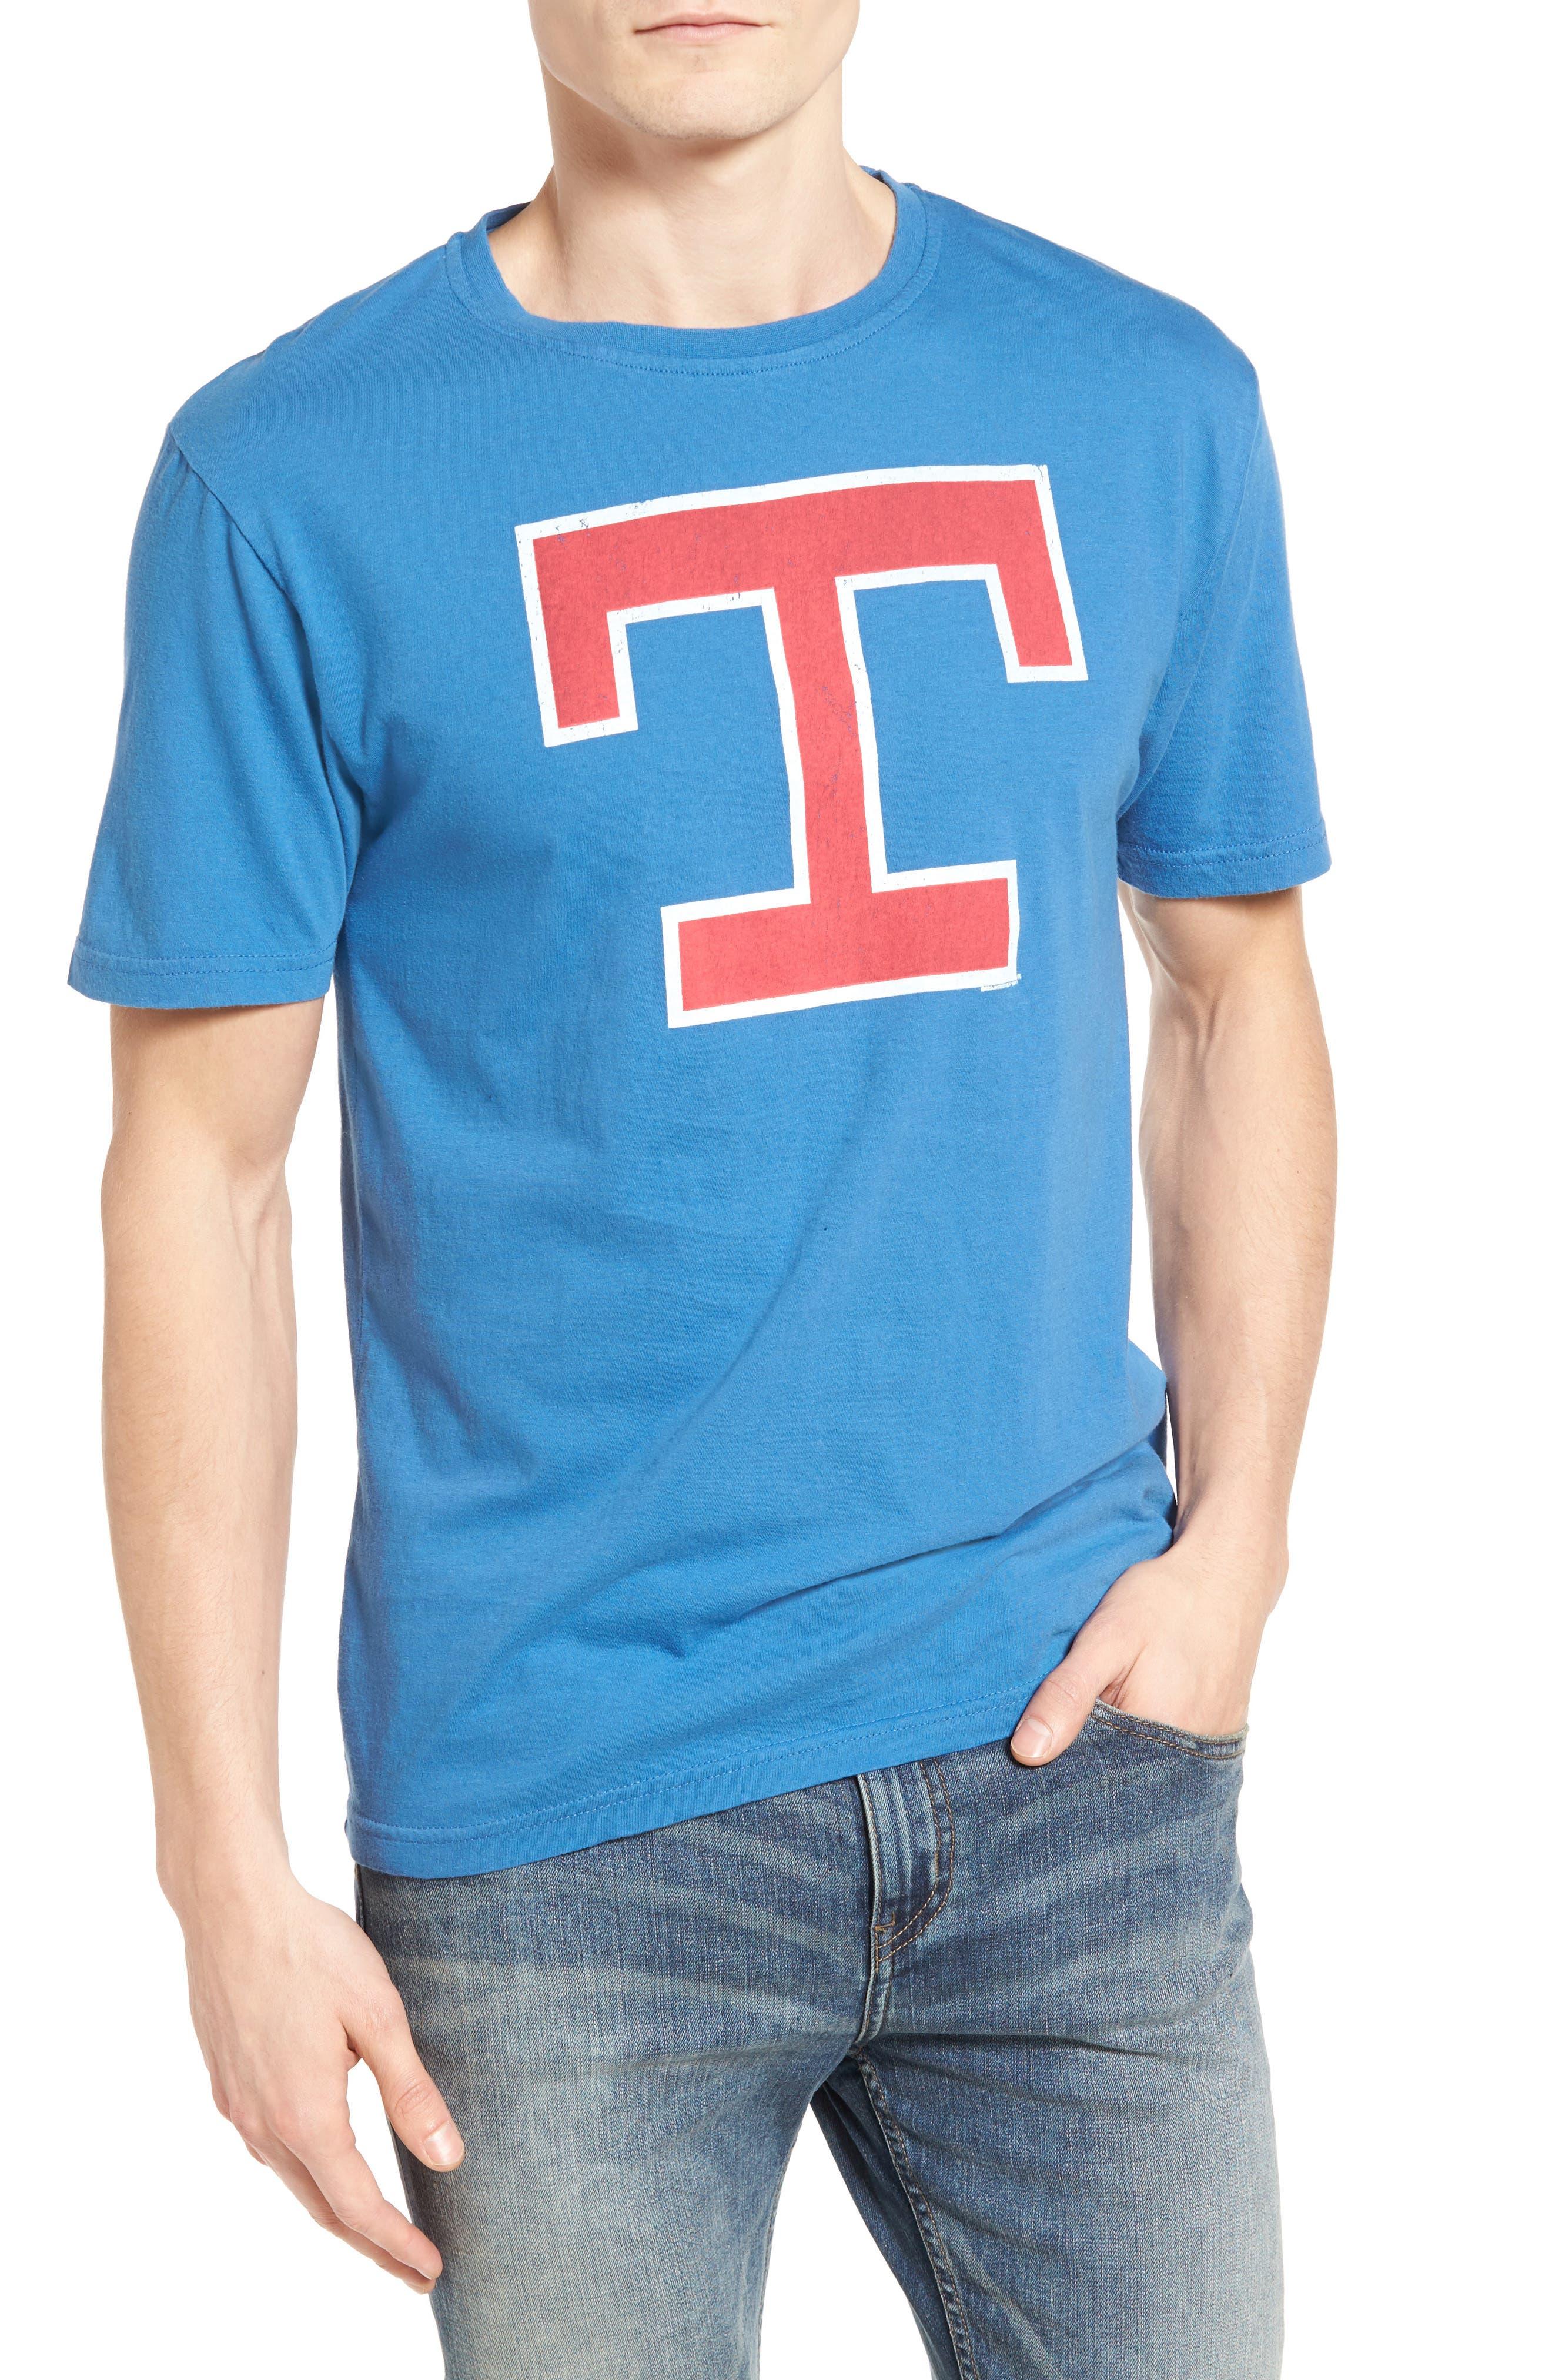 American Needle Brass Tack Texas Rangers T-Shirt